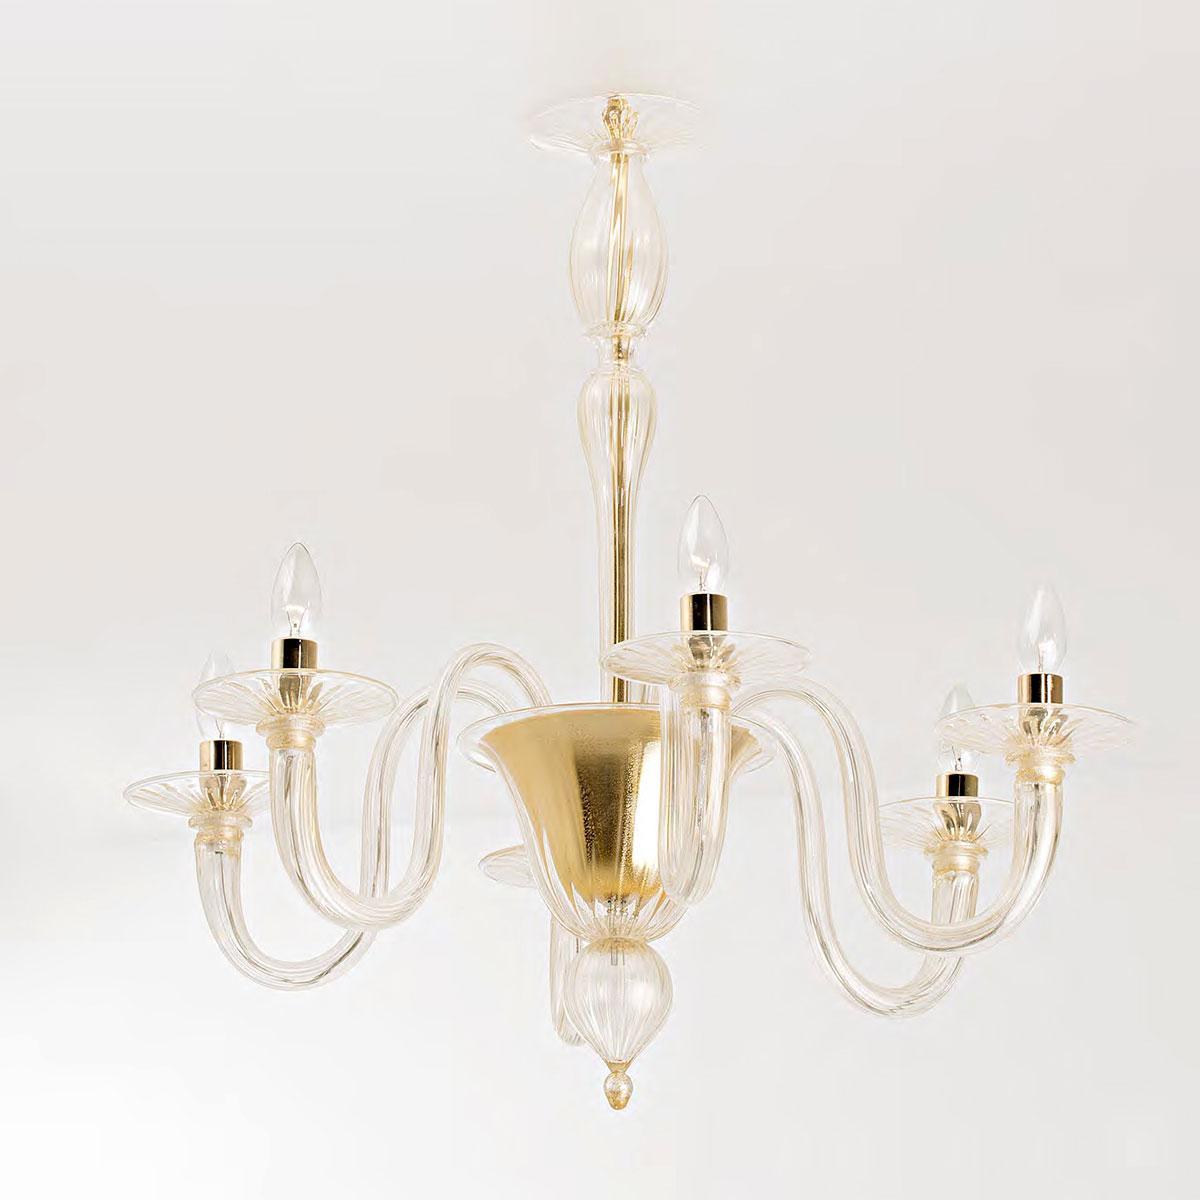 """Brigitta"" lustre en cristal de Murano - 6 lumières - or"